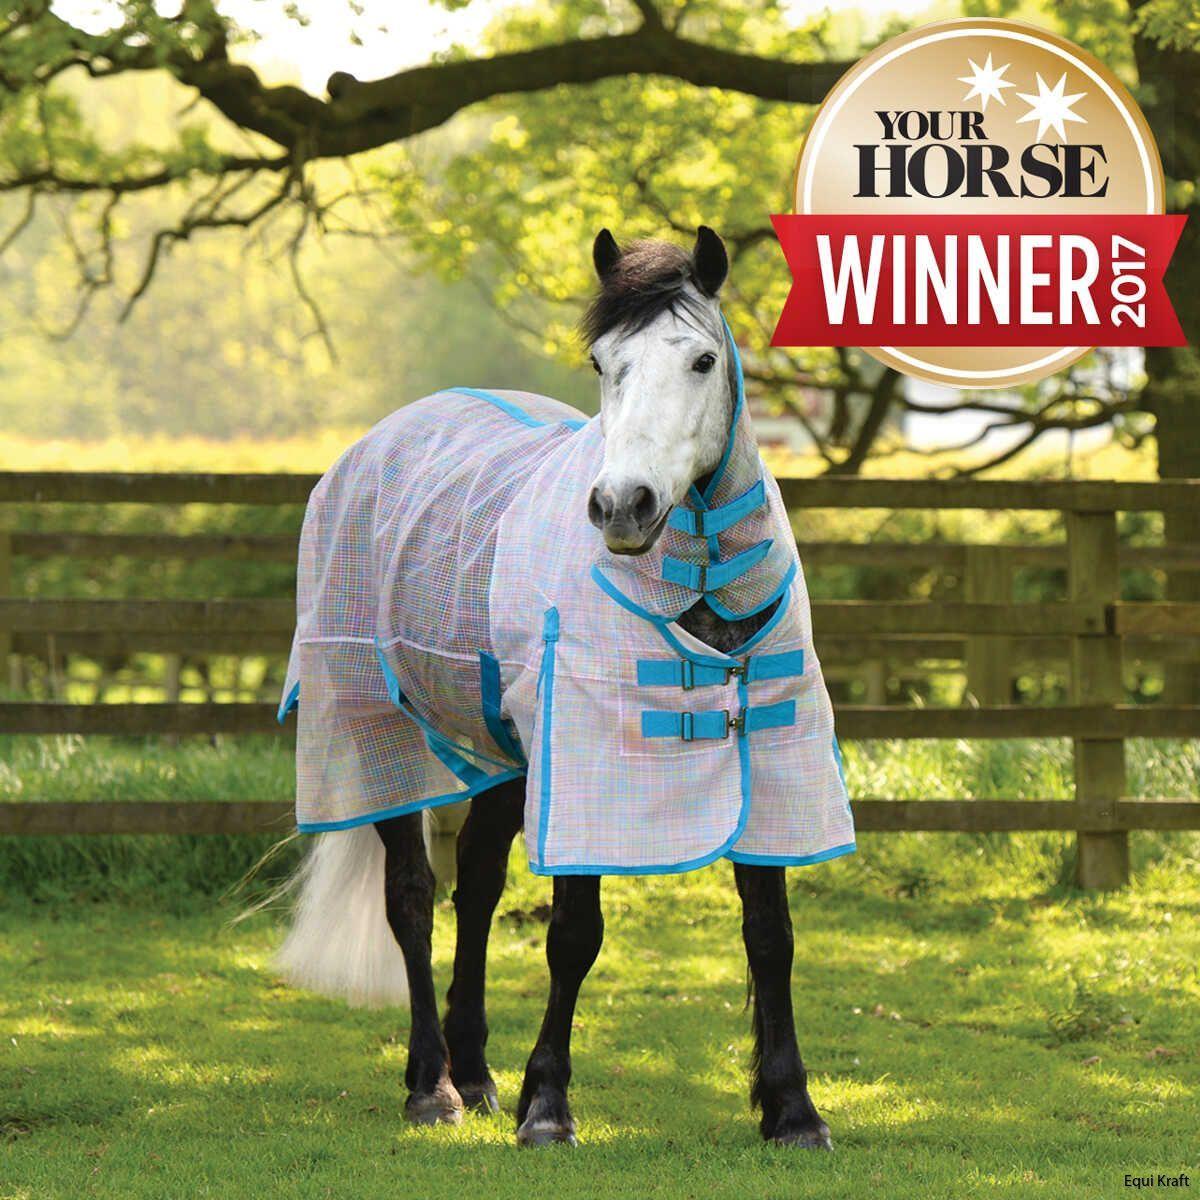 cv_ma5003h_mu02_your_horse_winner